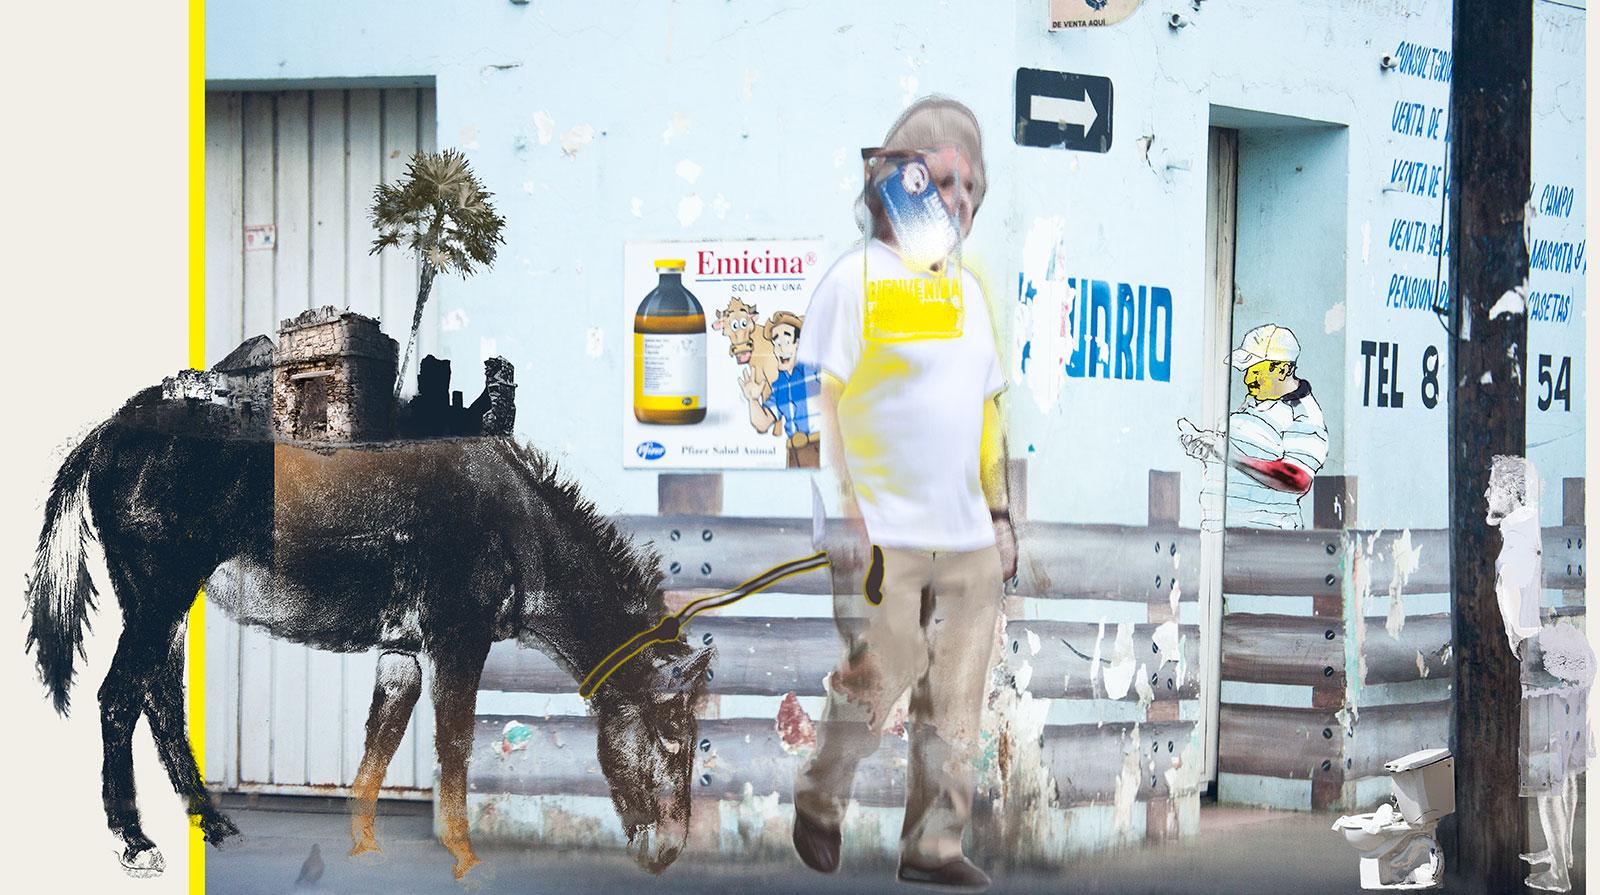 man walking donkey on street in Mexico